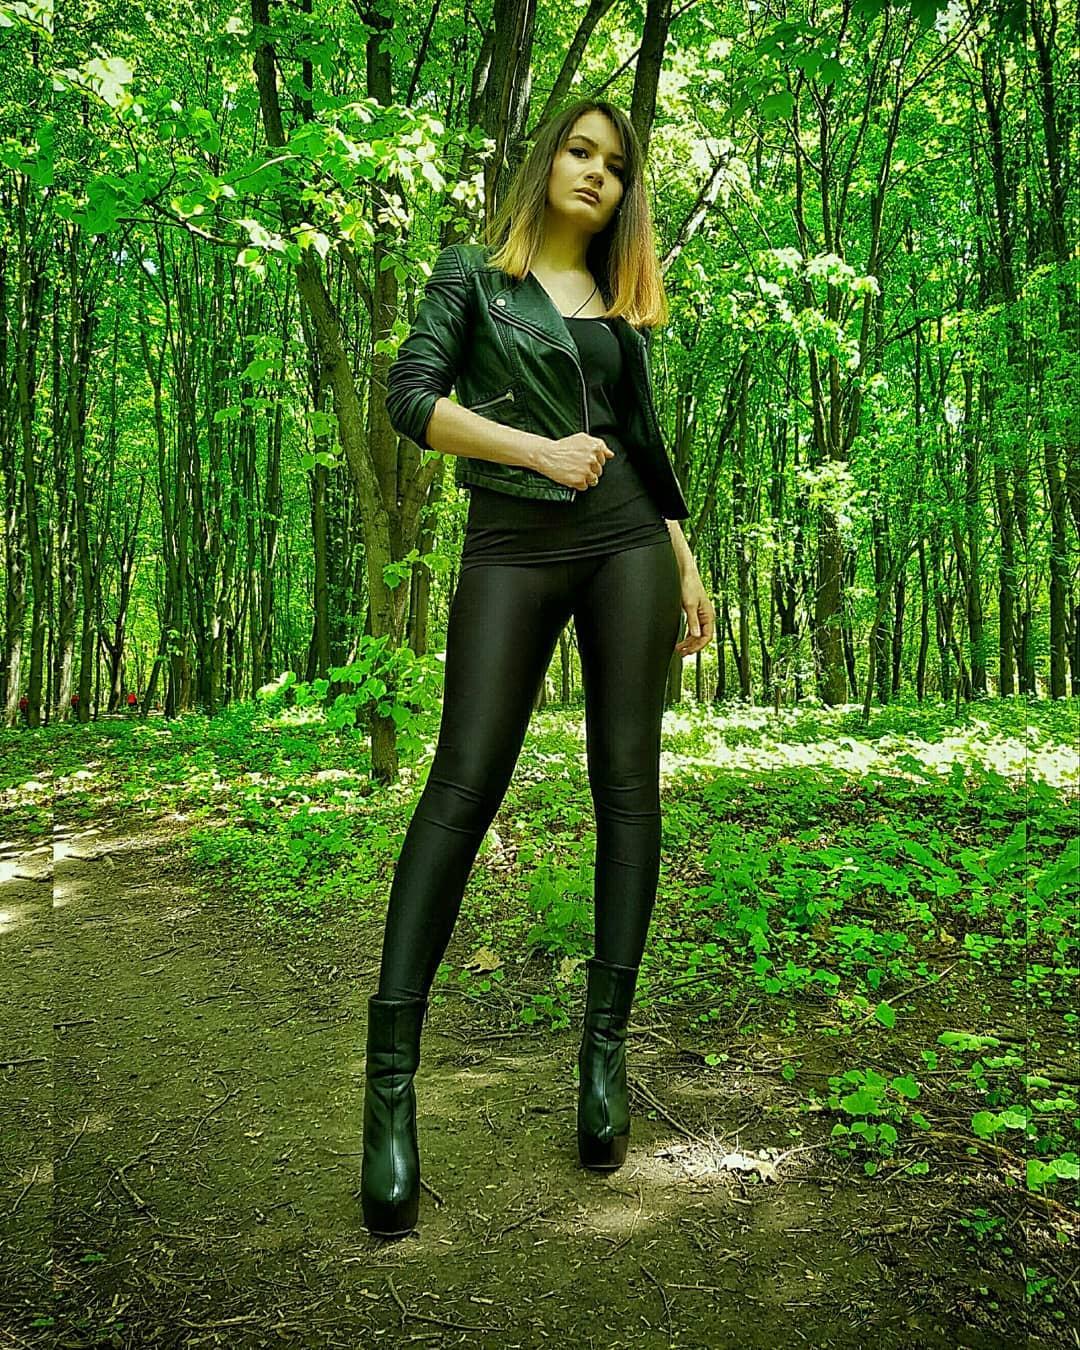 Olga-Madych-Wallpapers-Insta-Fit-Bio-4